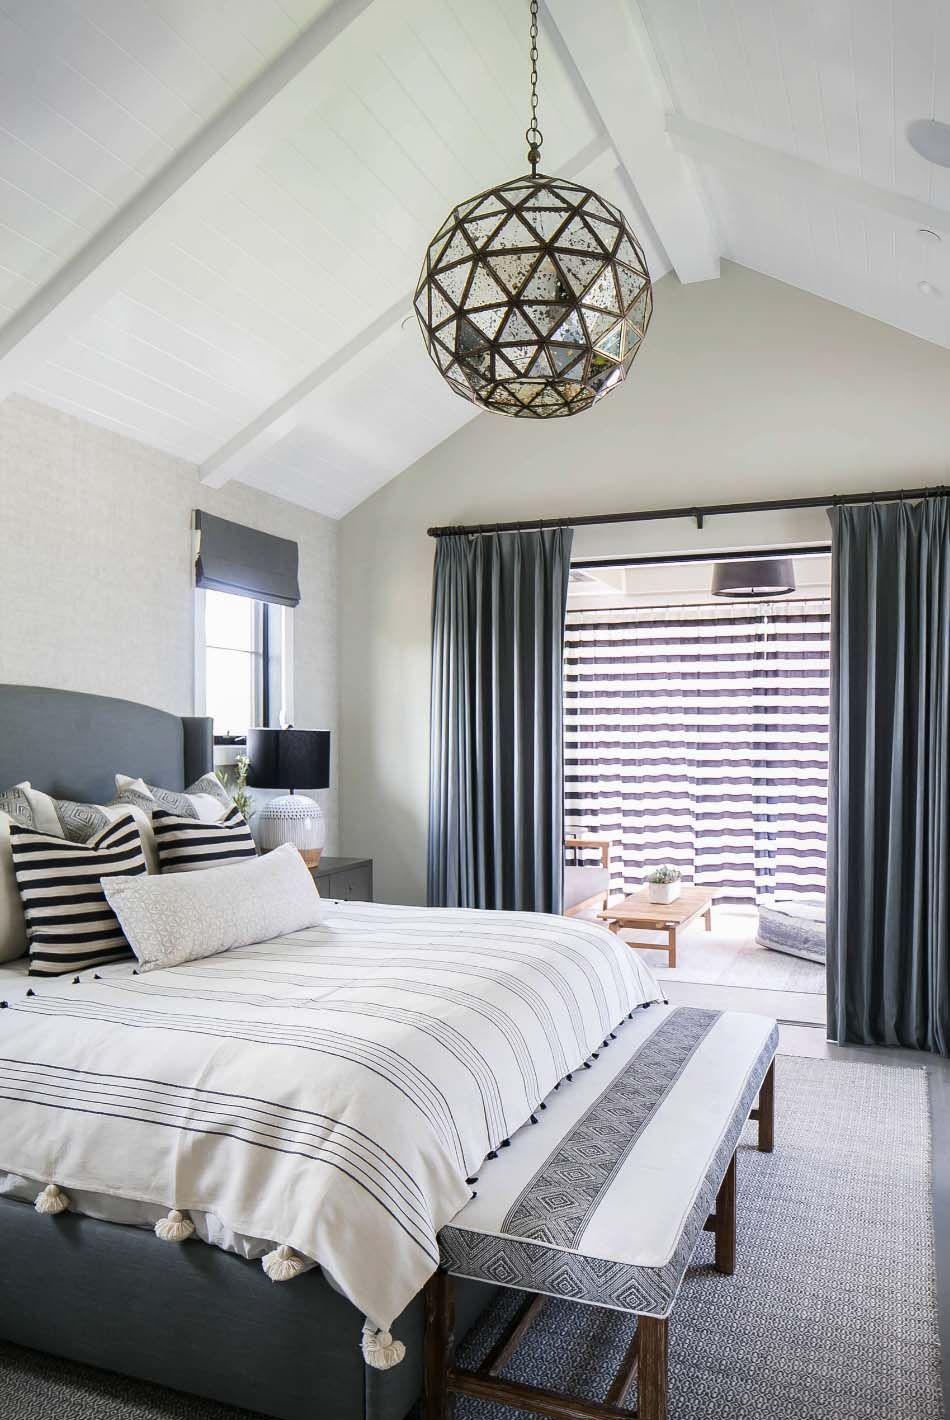 Modern Farmhouse Style Home With A Beachy Vibe In Newport Beach